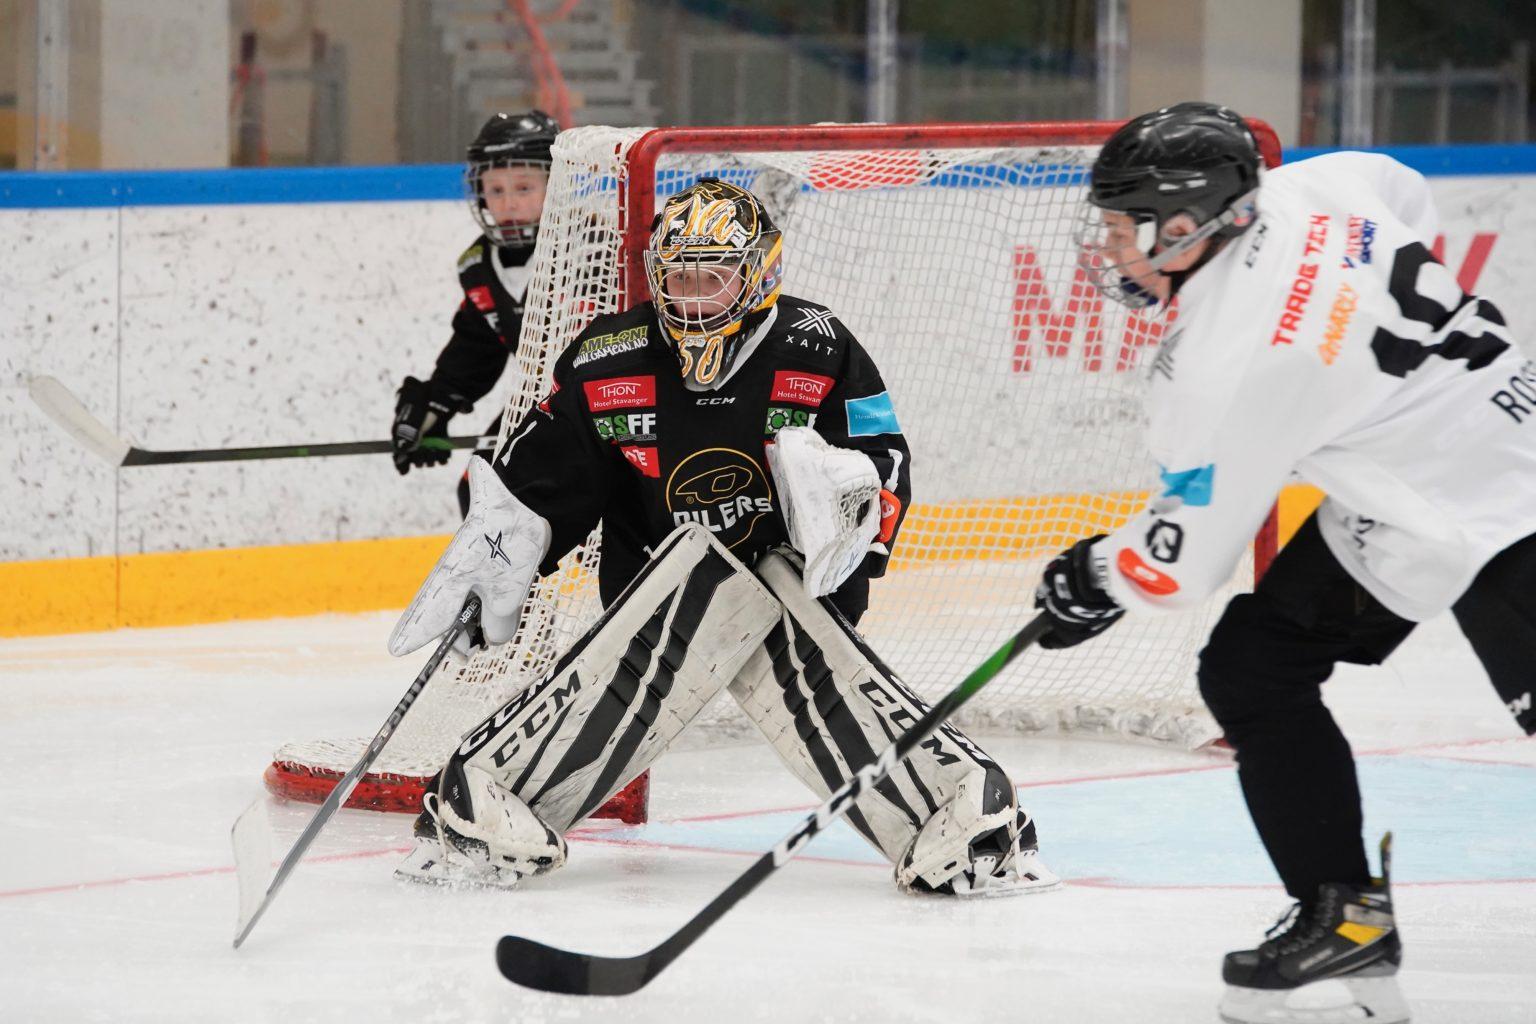 Internkamp Stavanger Hockey Oilers Goalie TradeTech Gnarly intersport Thon SFF BATE GameOn XAIT Solland